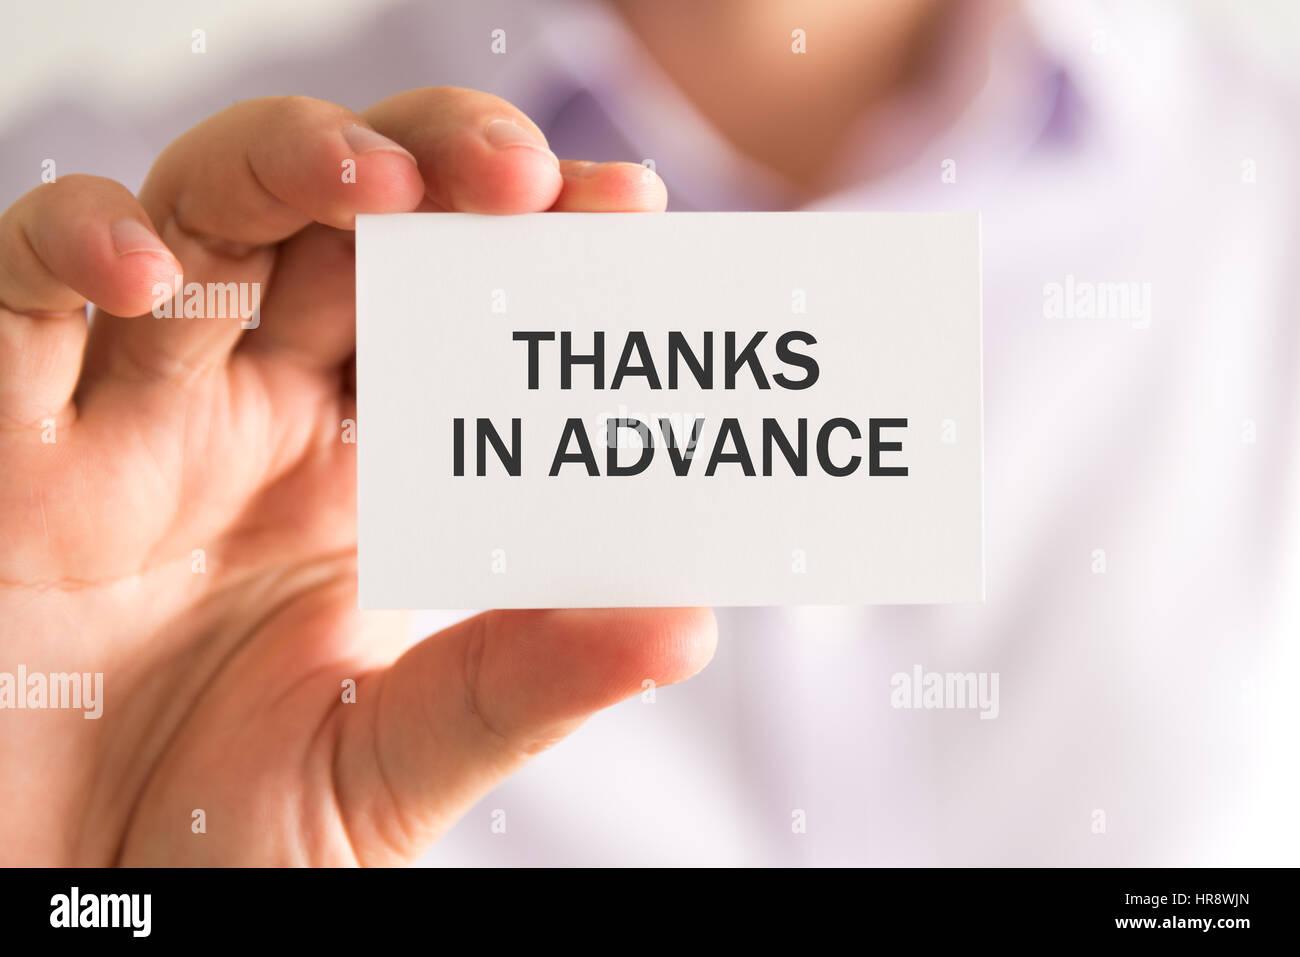 d7d2e2f2b0f Thanks In Advance Stock Photos & Thanks In Advance Stock Images - Alamy